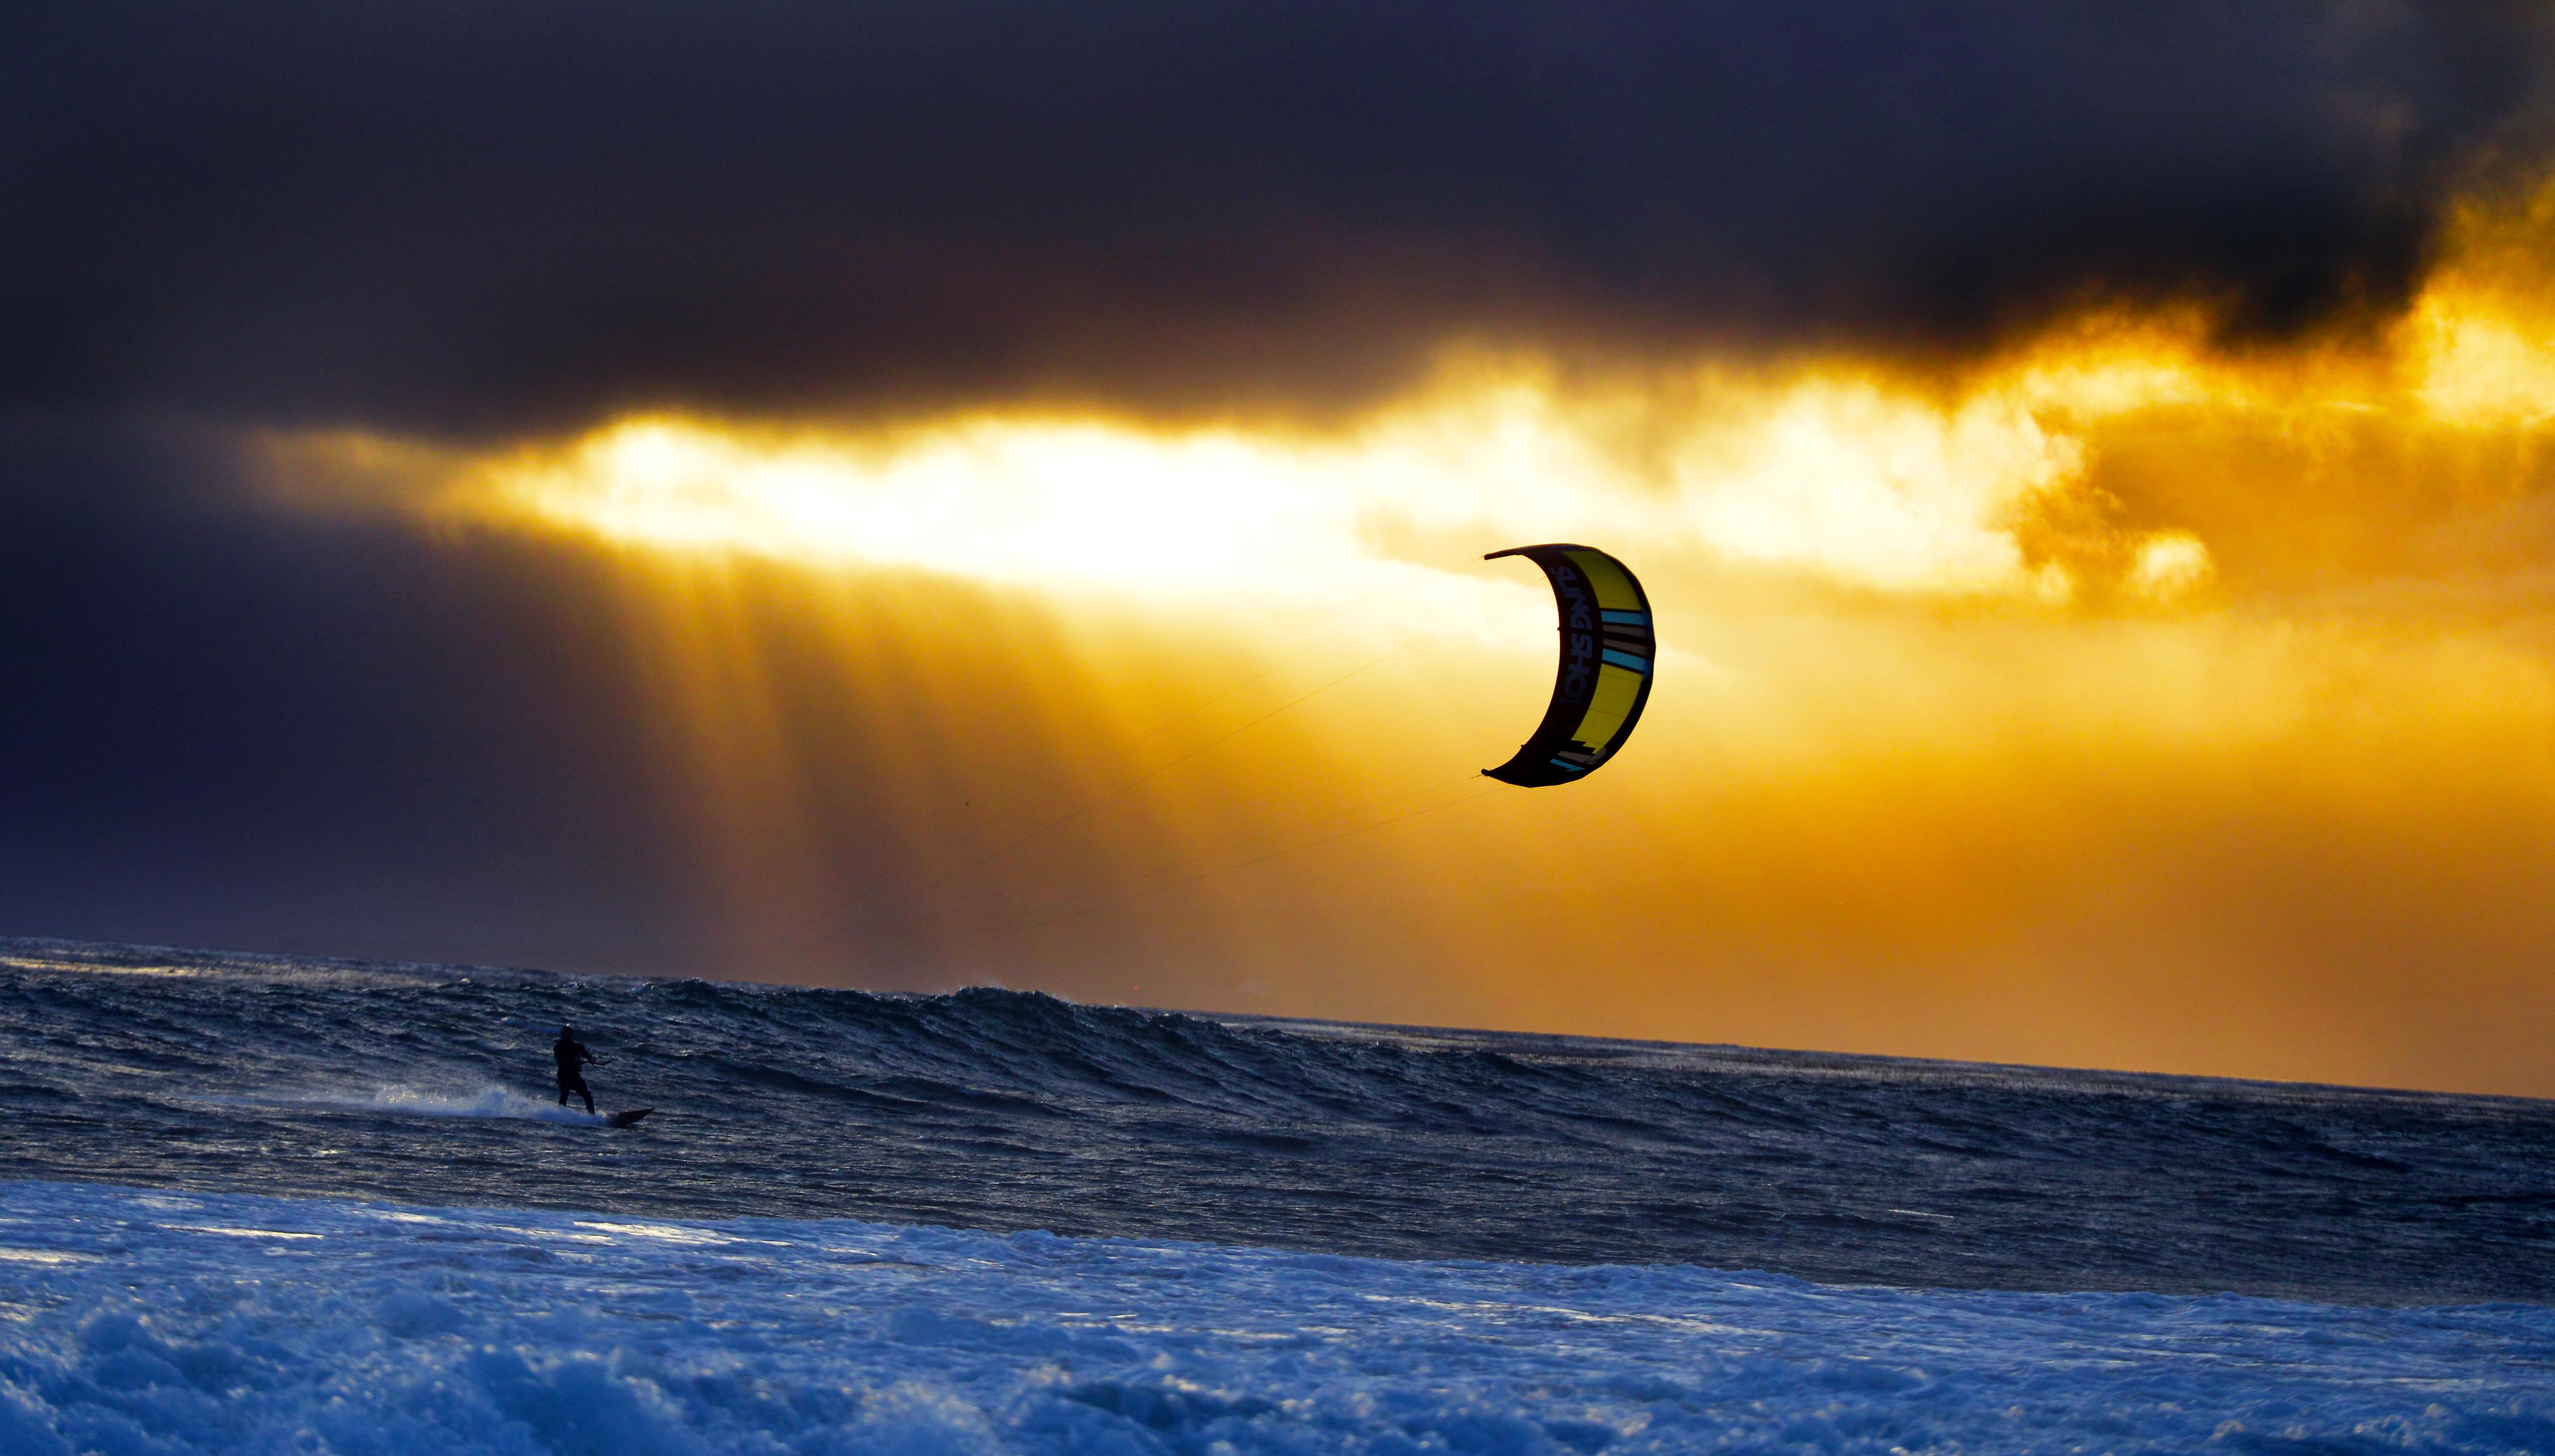 kitesurf wallpaper image - A kitesurfer cruising at sunset with his 2016 Slingshot Wave SST kite. - in resolution: Original 5776 X 3292